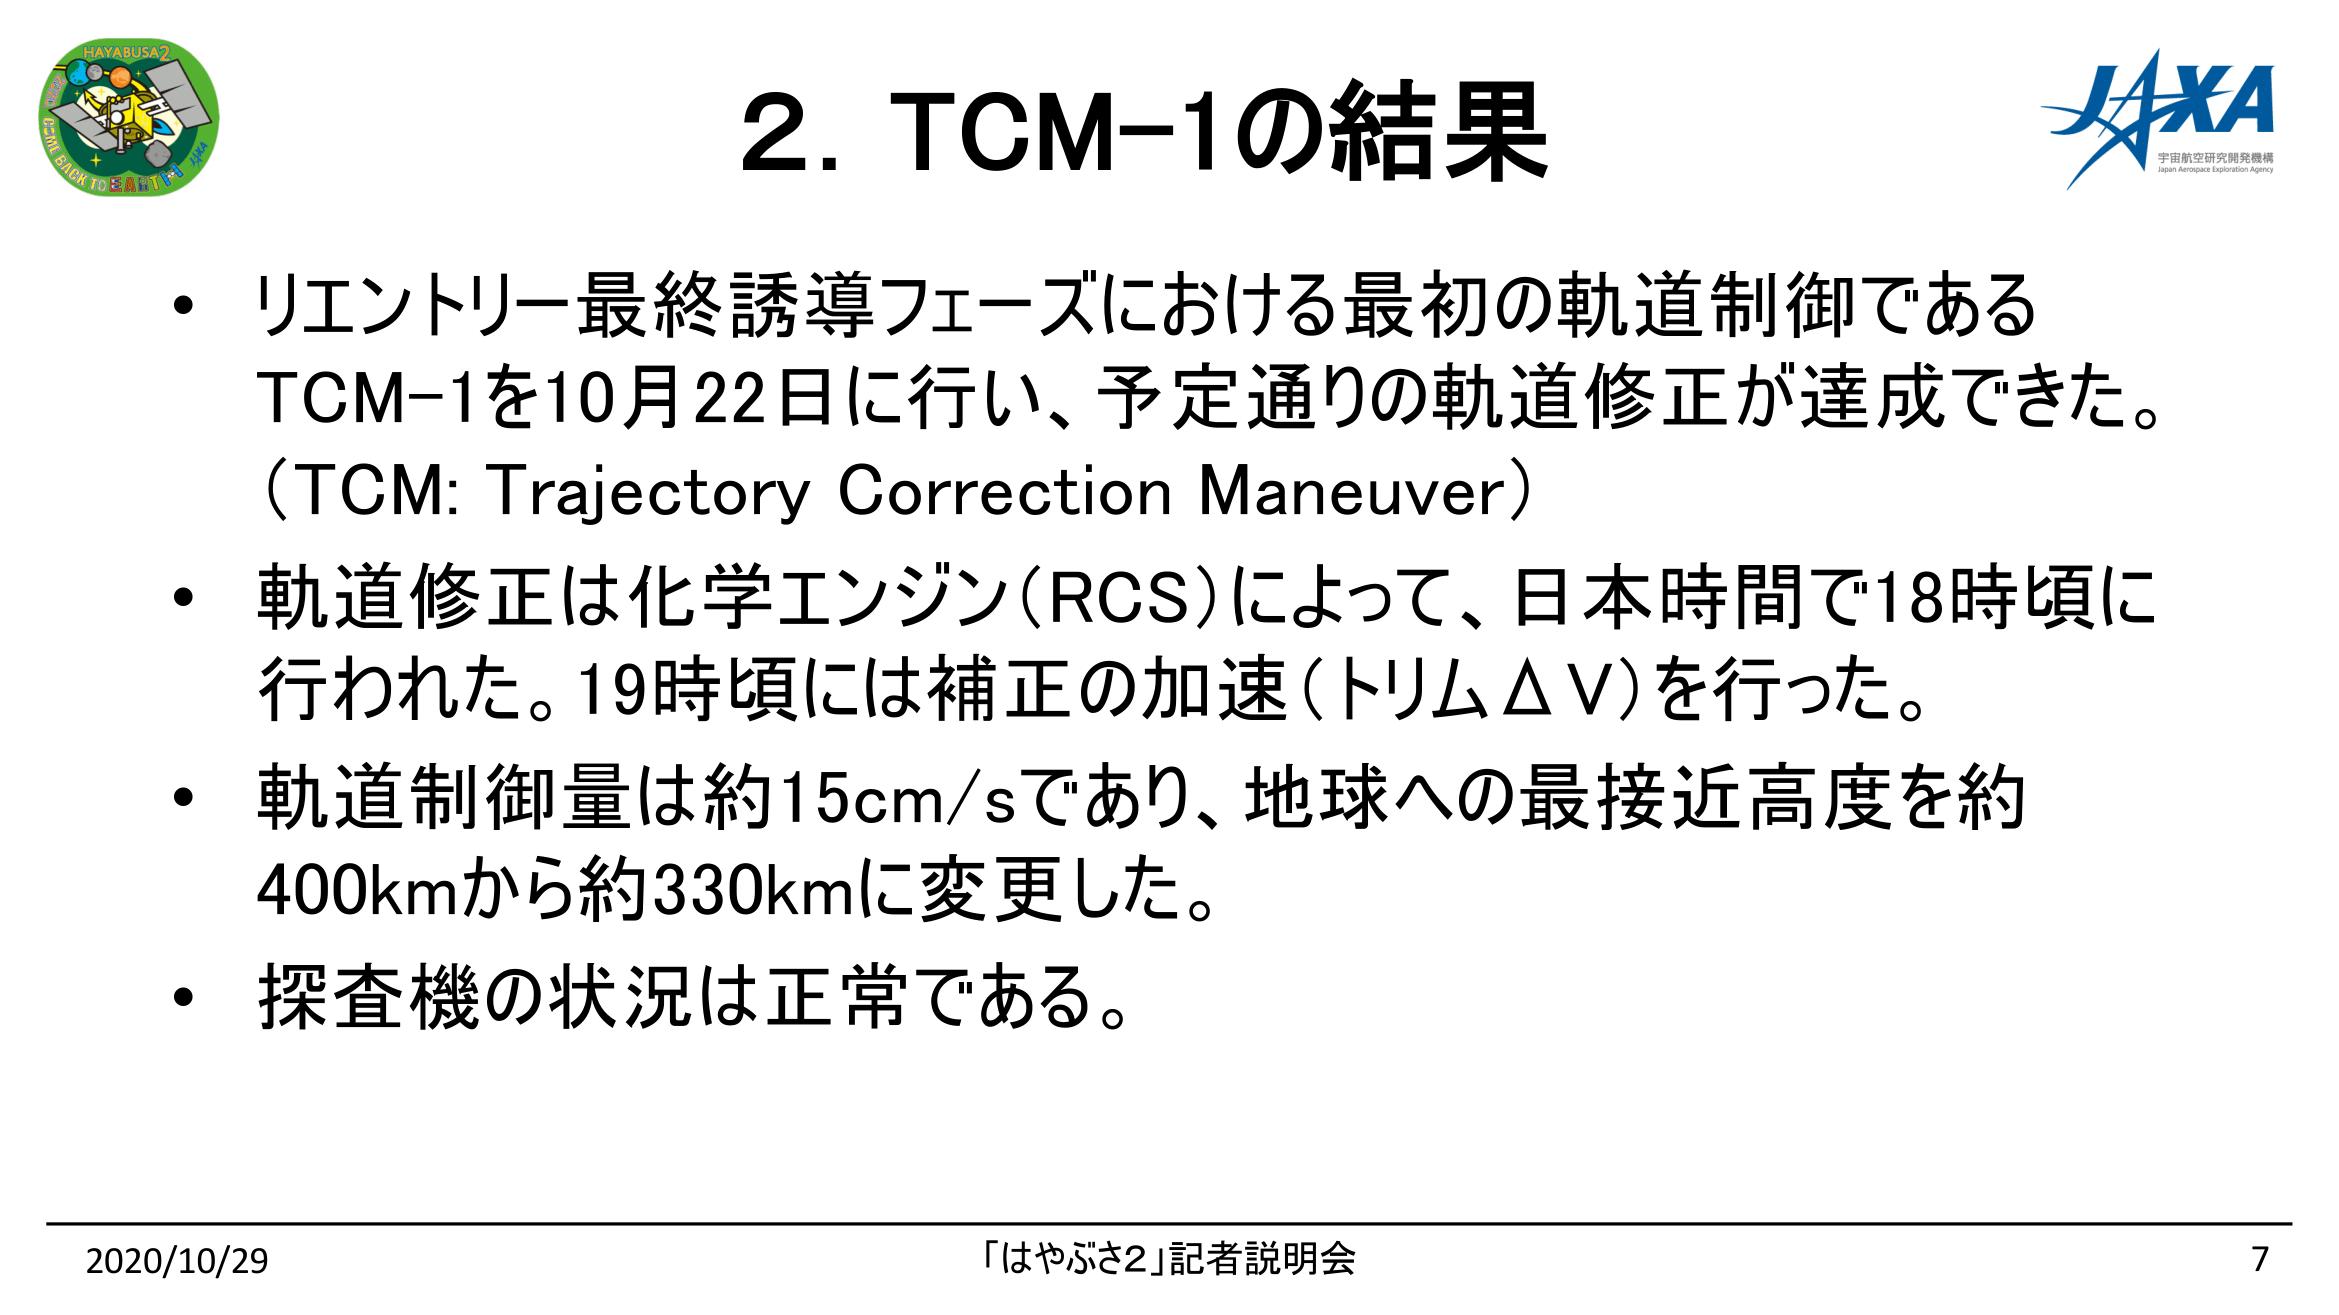 f:id:Imamura:20201029161254p:plain